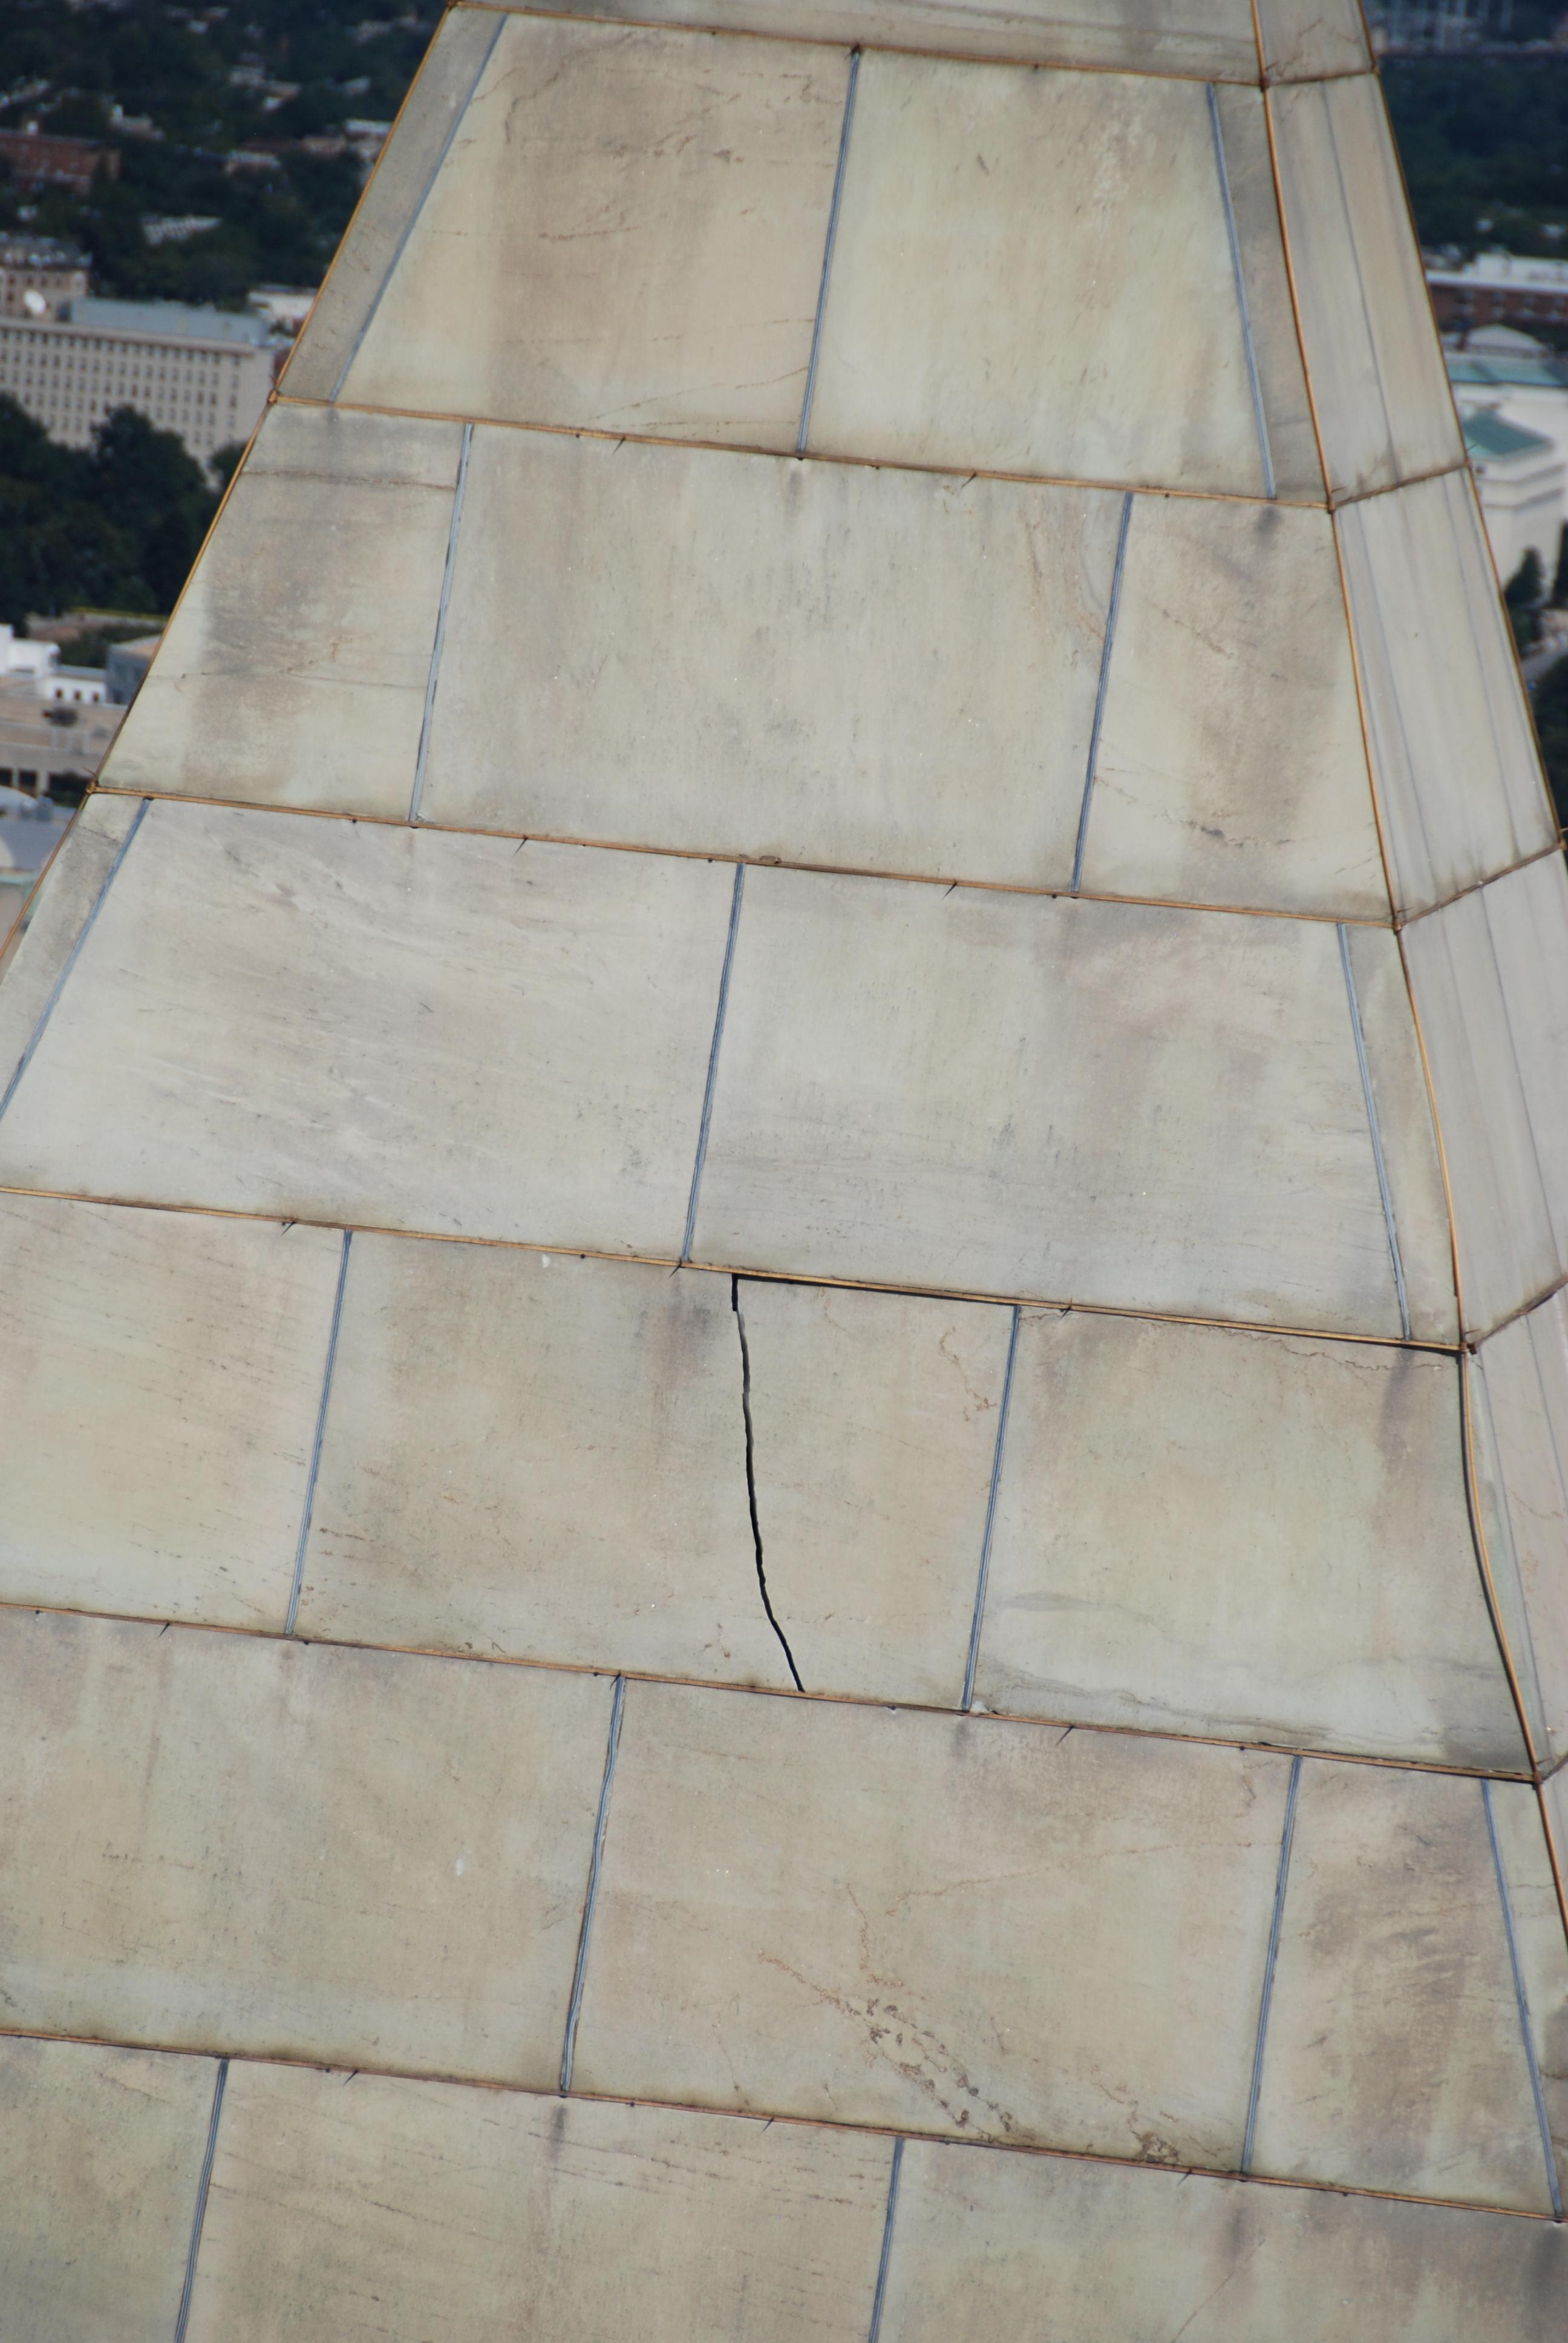 Earthquake damage on the exterior of the Washington Monument. Photo taken on August 23, 2011.